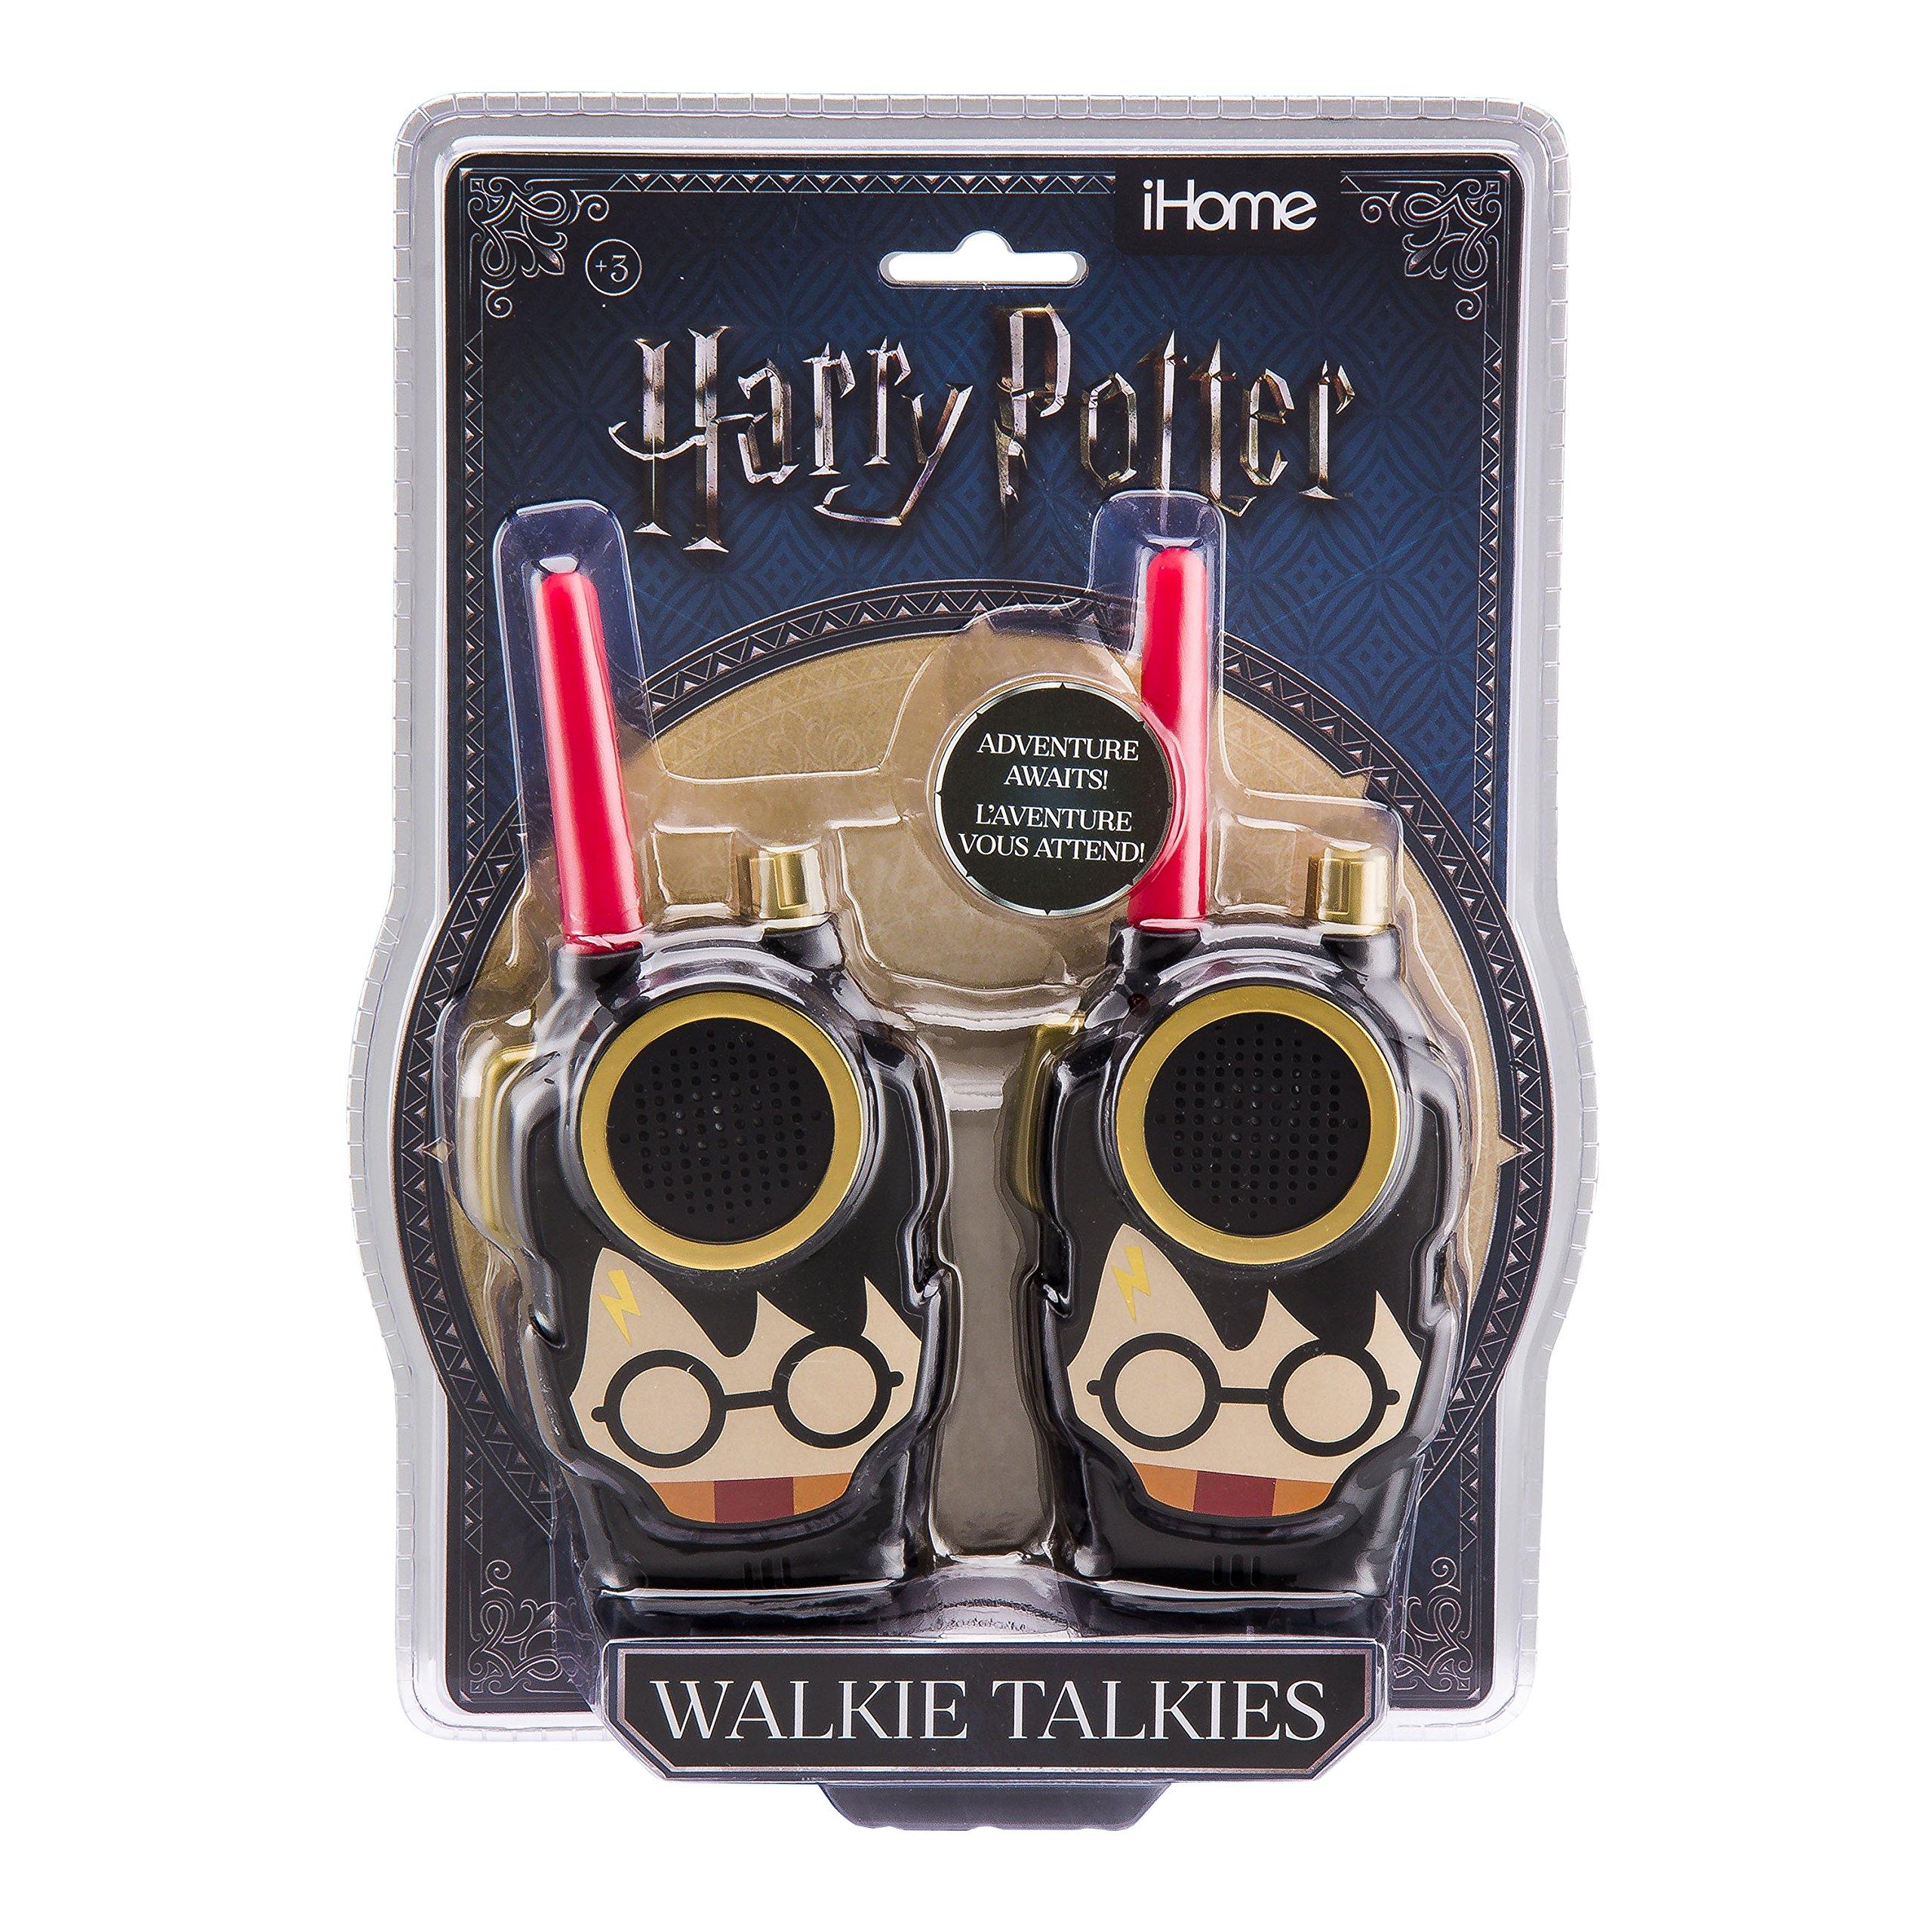 Harry Potter Walkie Talkies for Kids - FRS, Long Range, Adjustable Volume Control